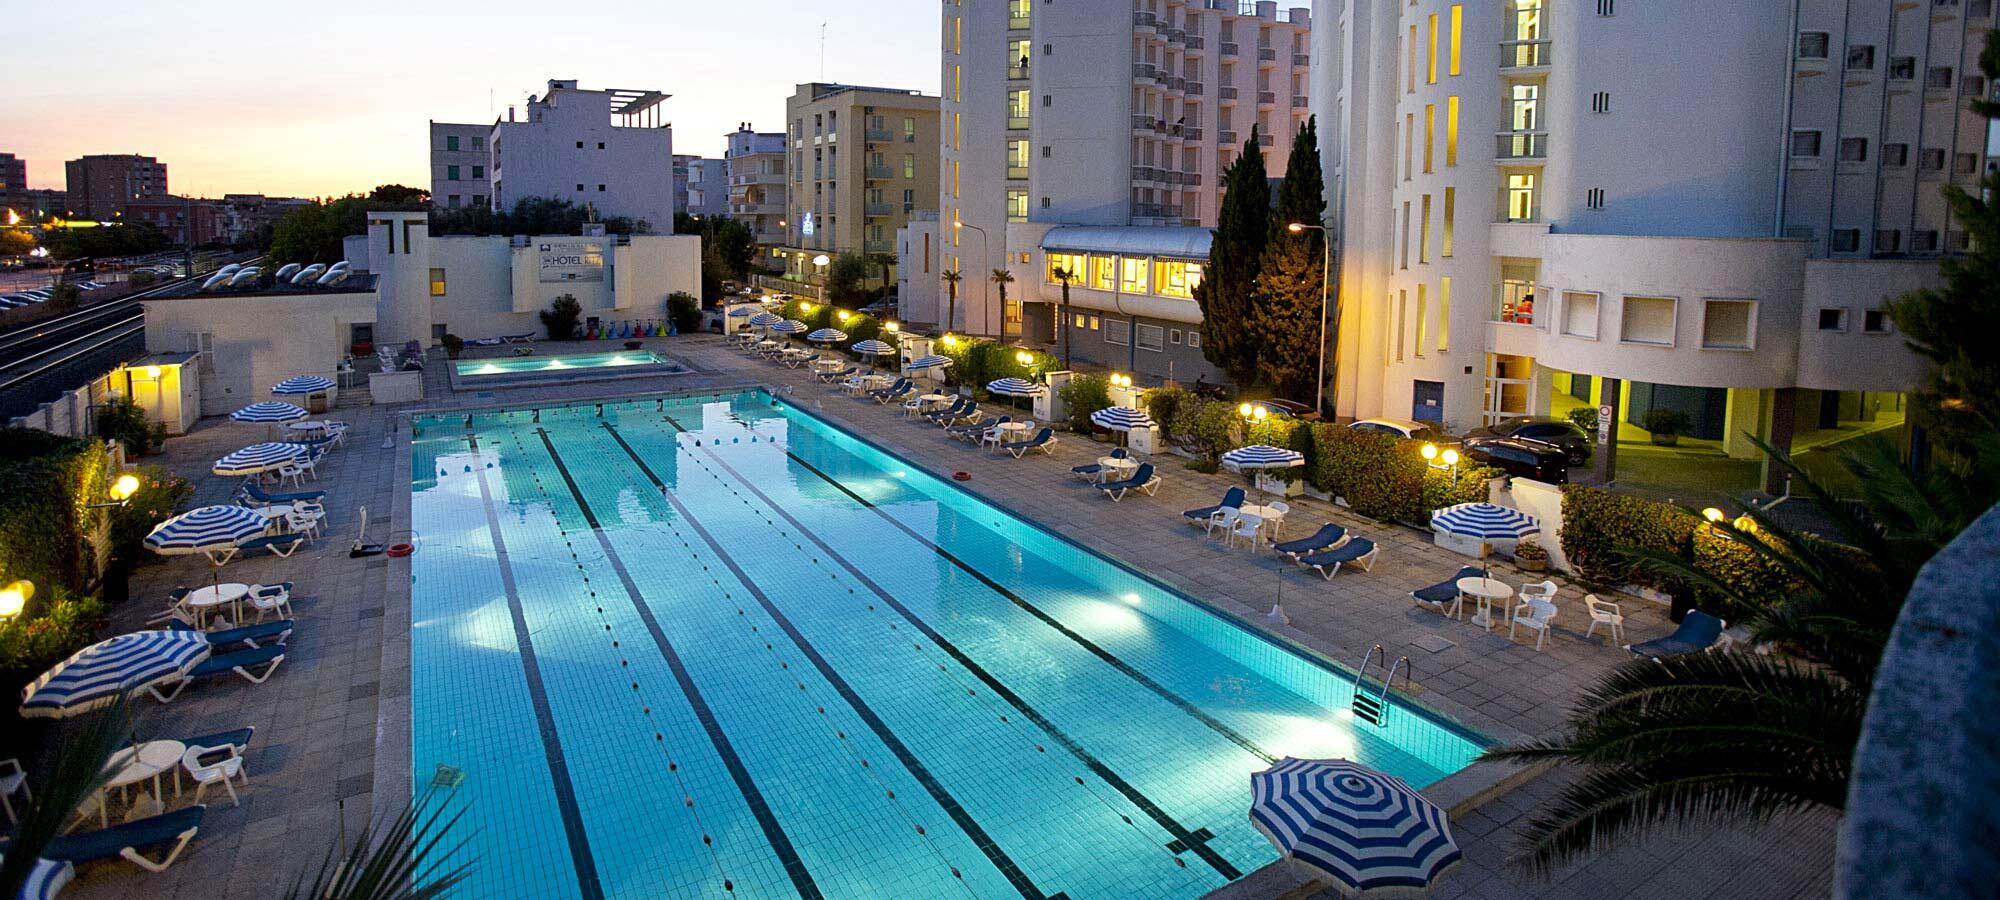 Bagni N.95  - Hotel Ritz